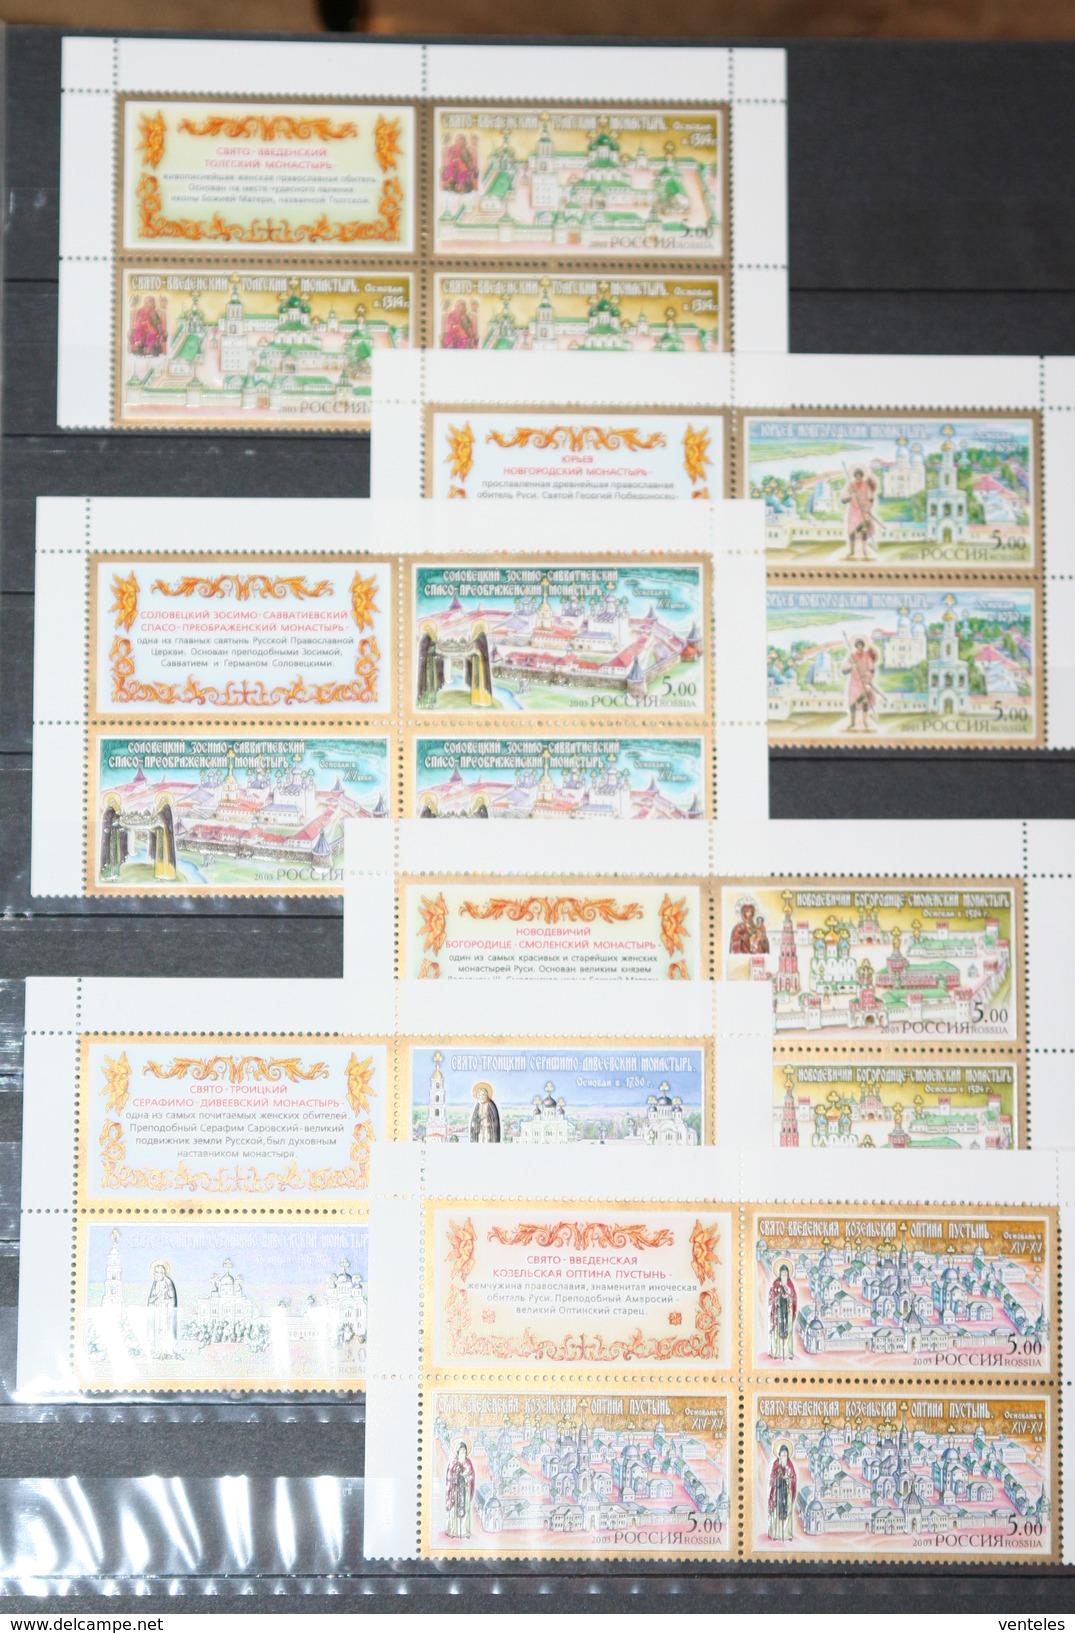 Russia 26.03.2003 Blocks Of 3 + Upper Vignette Mi # 1068-73 Zf, Monasteries Of The Russian Orthodox Church (II) MNH OG - Nuevos